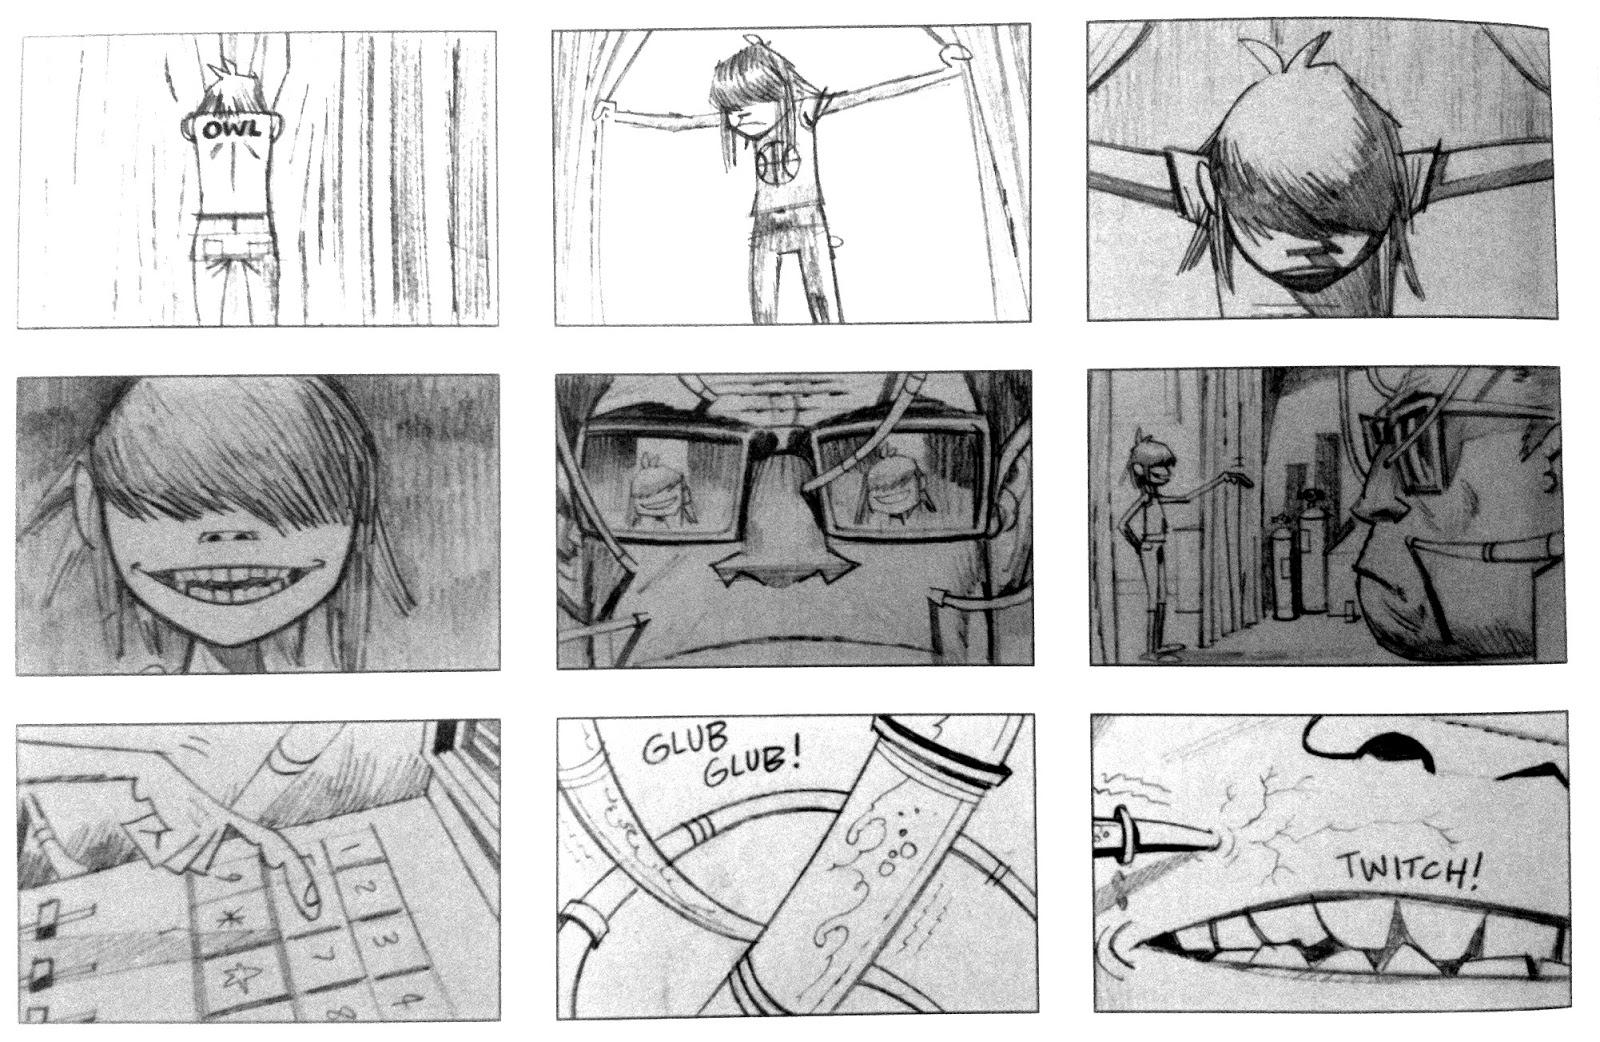 Scribble Junkies: Storyboards from Gorillaz